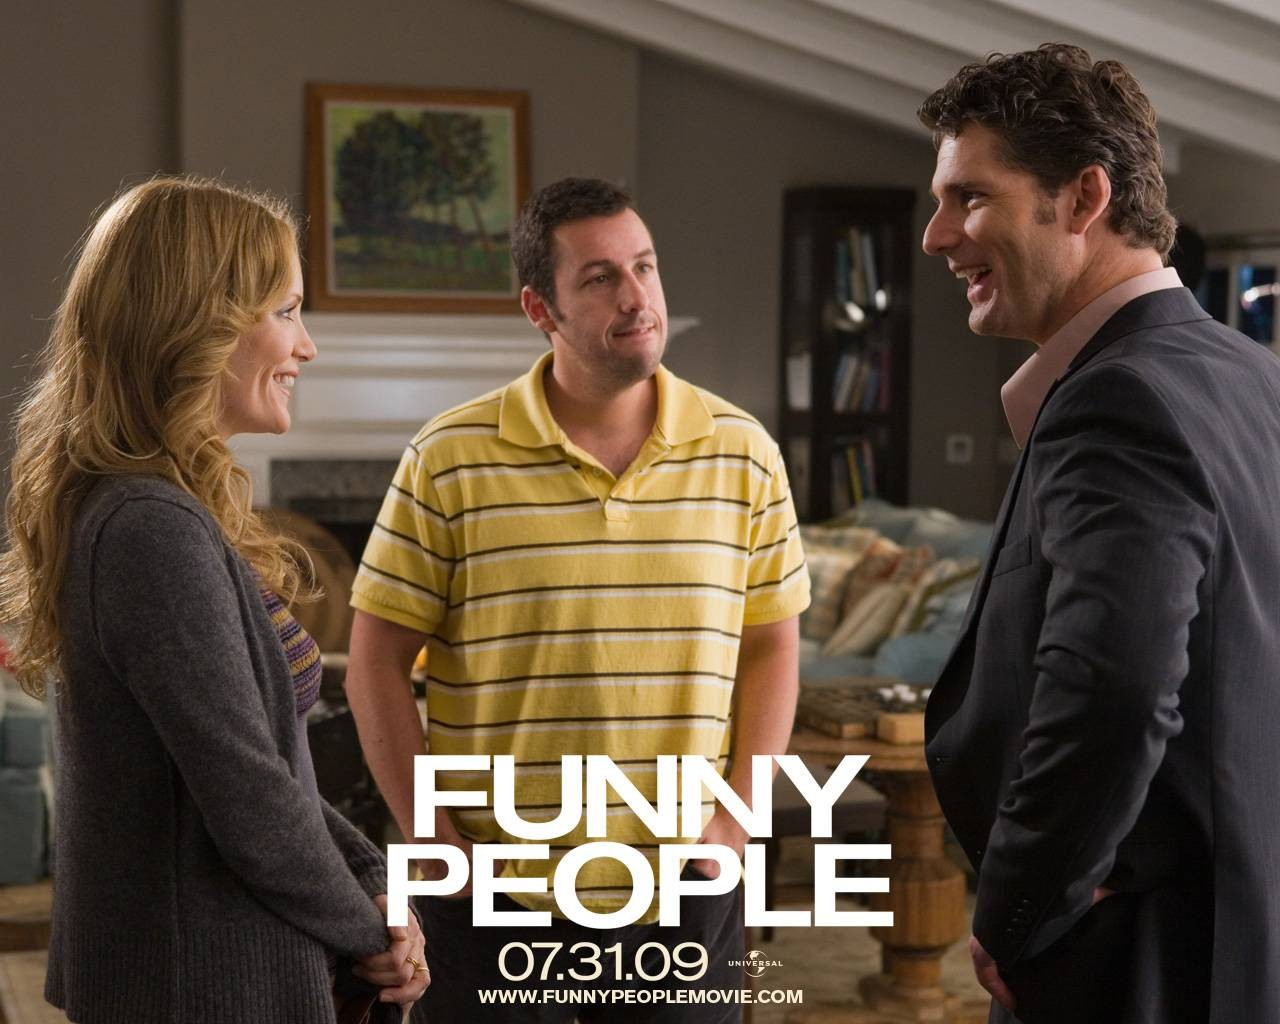 Wallpaper del film Funny People con Leslie Mann, Adam Sandler ed Eric Bana